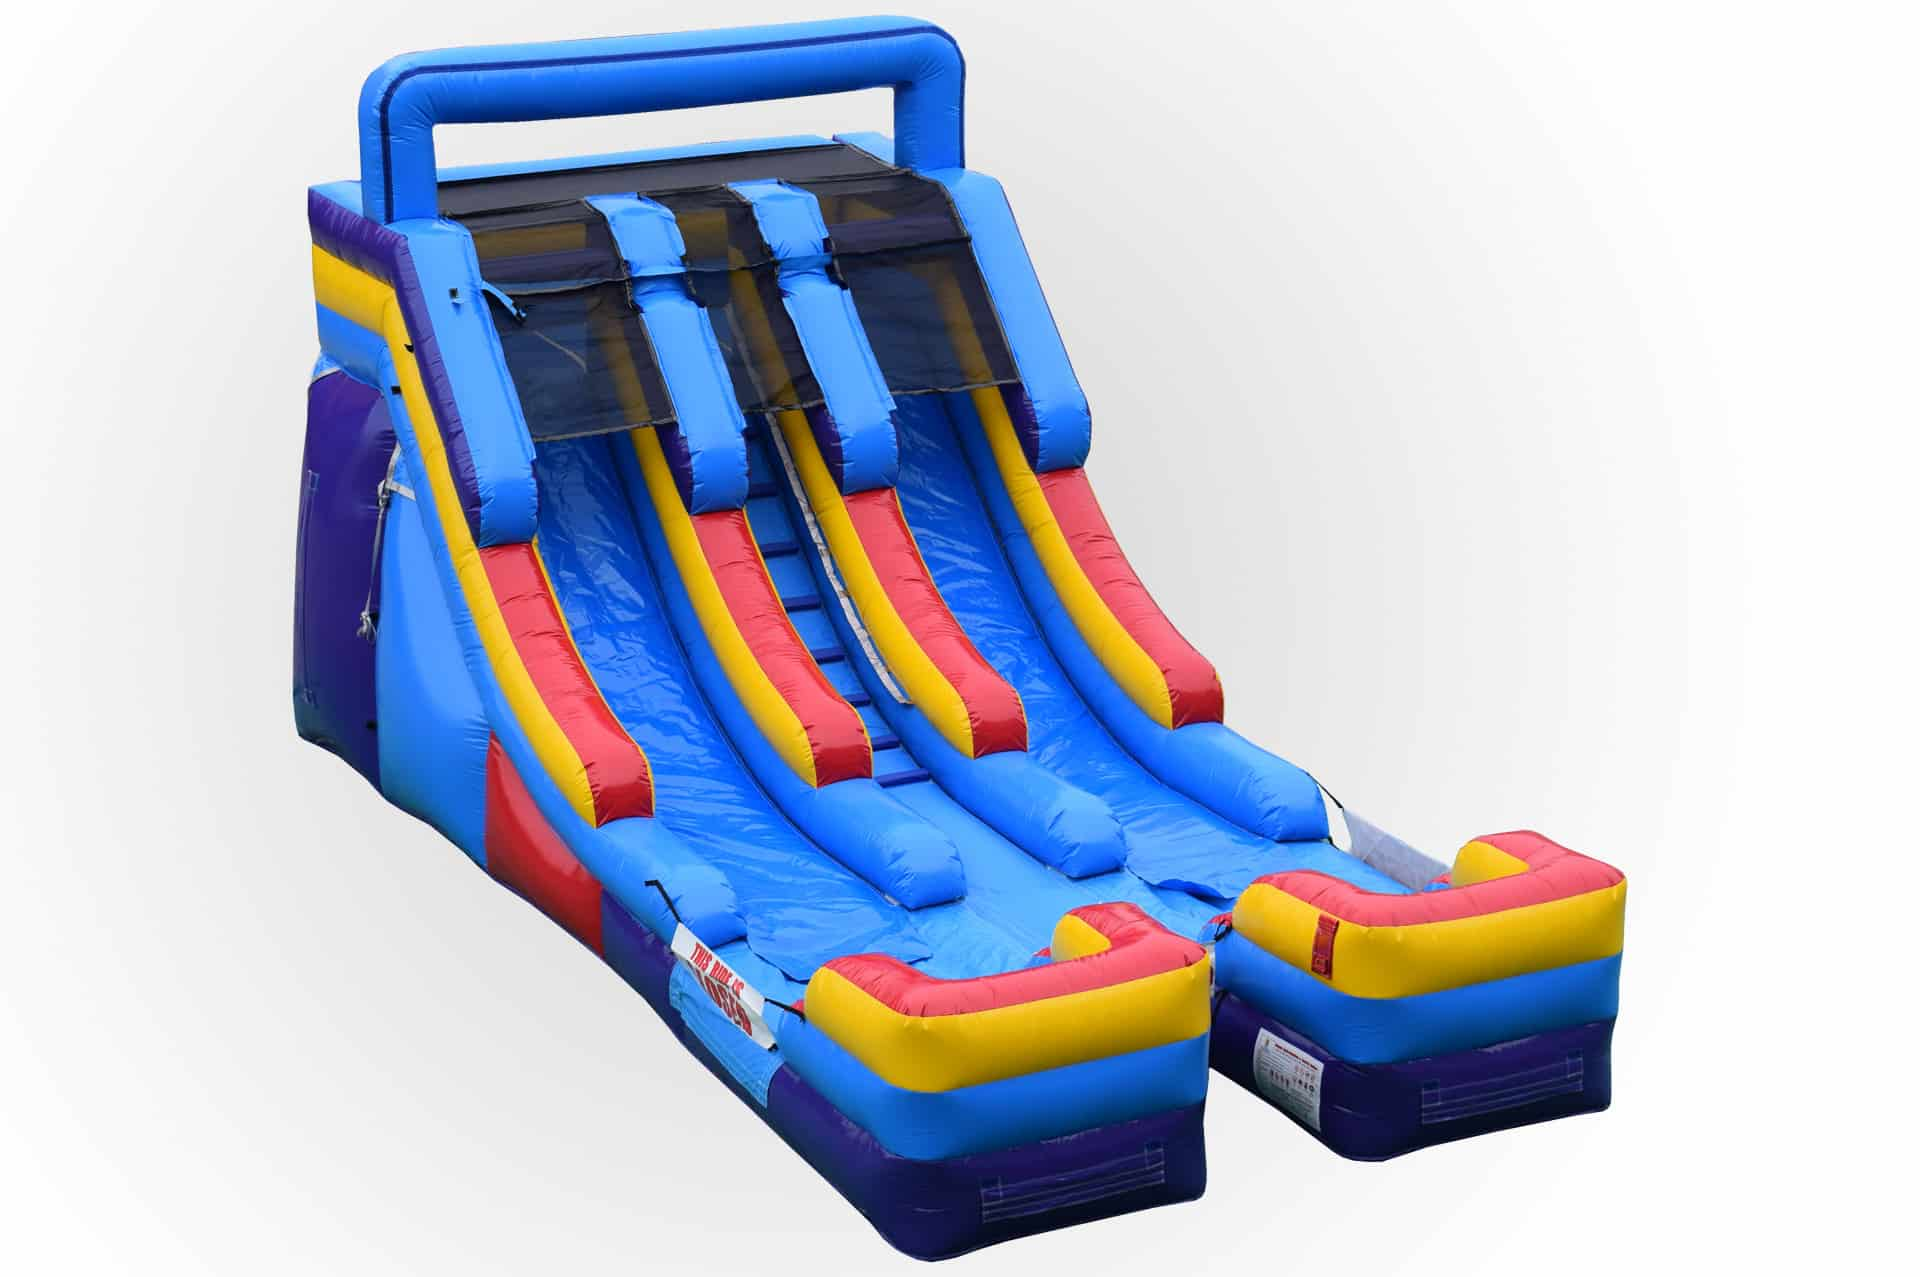 15 Foot Dual Lane Slide Retro